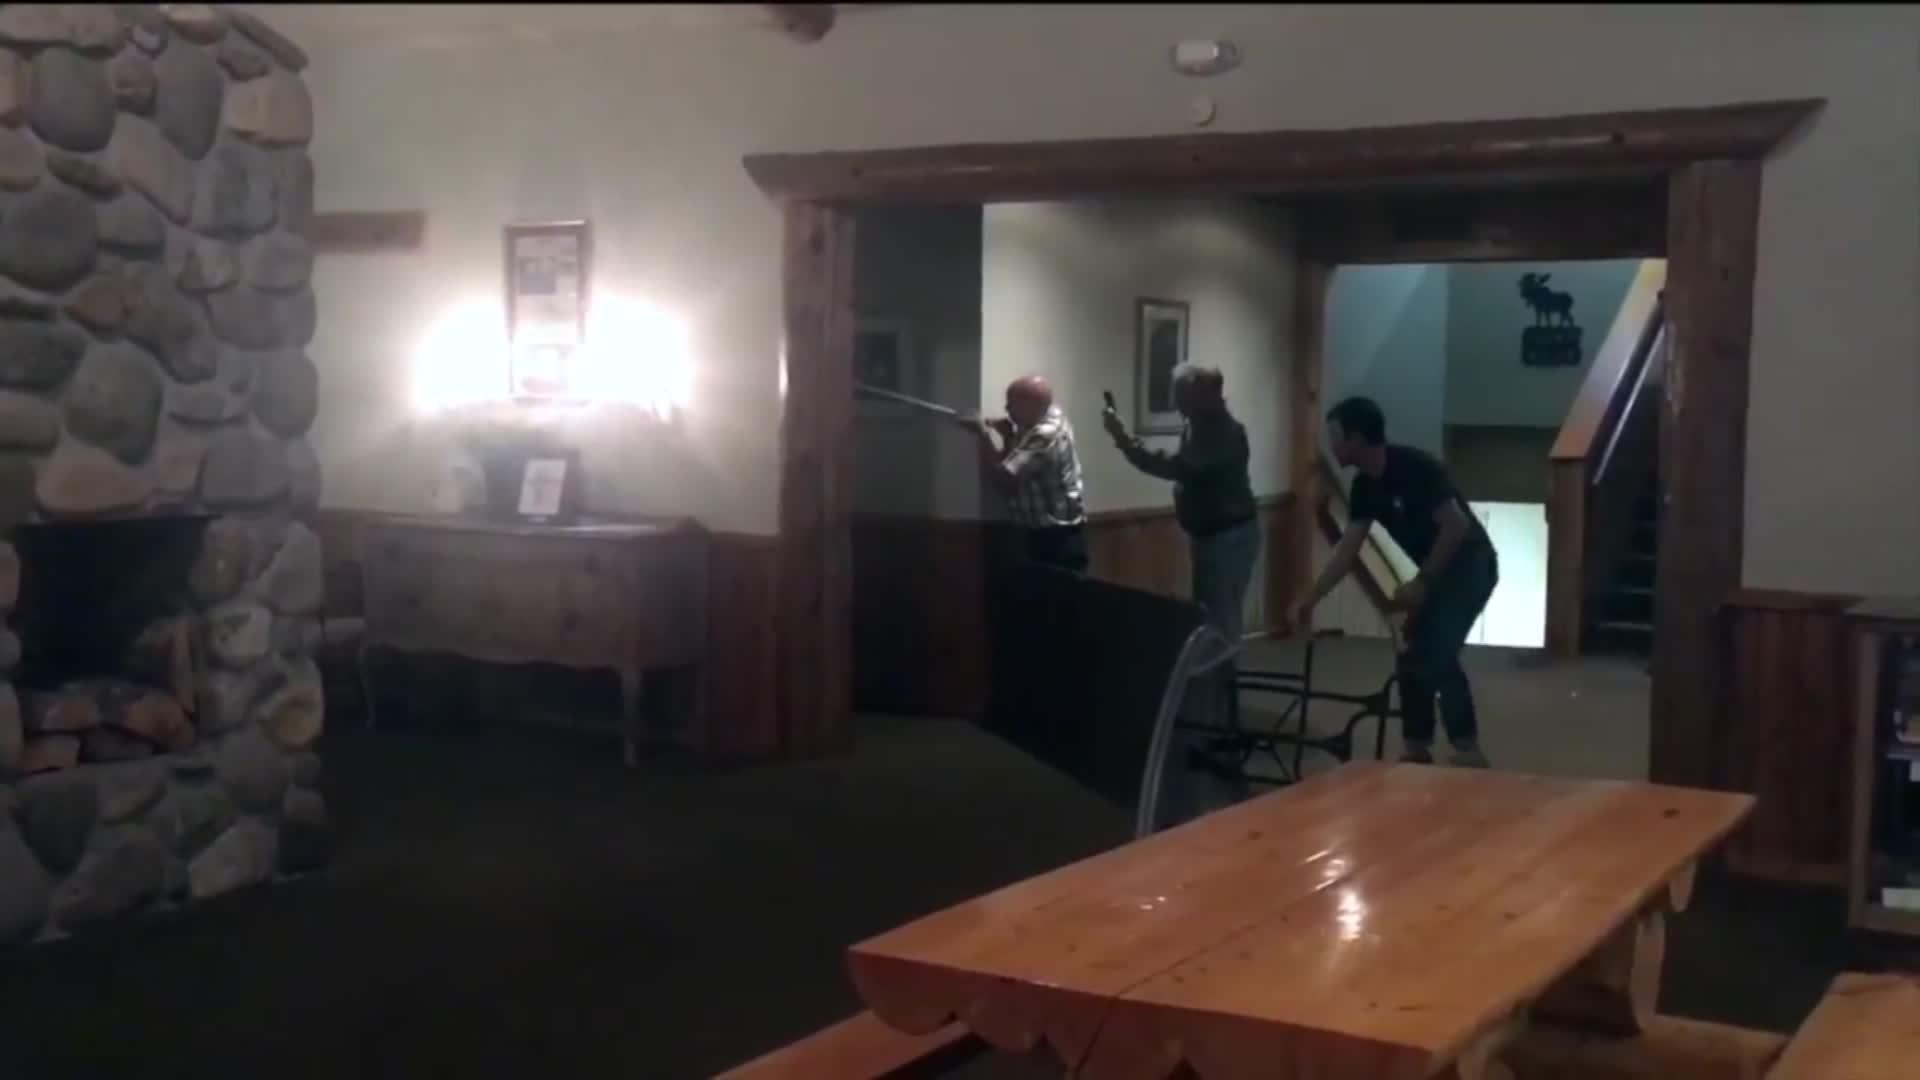 Black bear found resting in Montana lodge washroom | CNN Travel